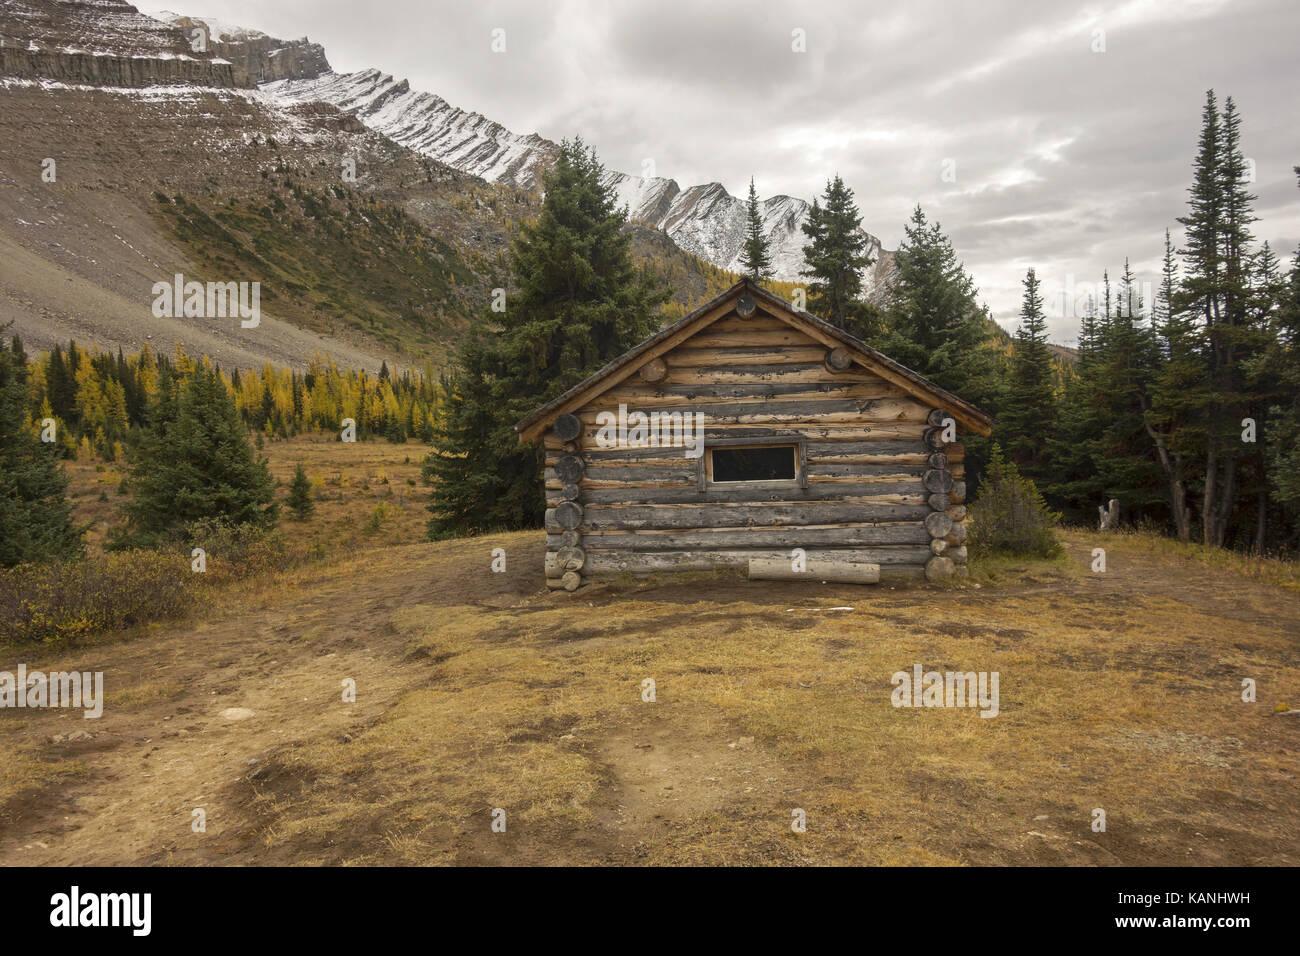 Halfway Hut, vintage landmark log cabin on great hiking